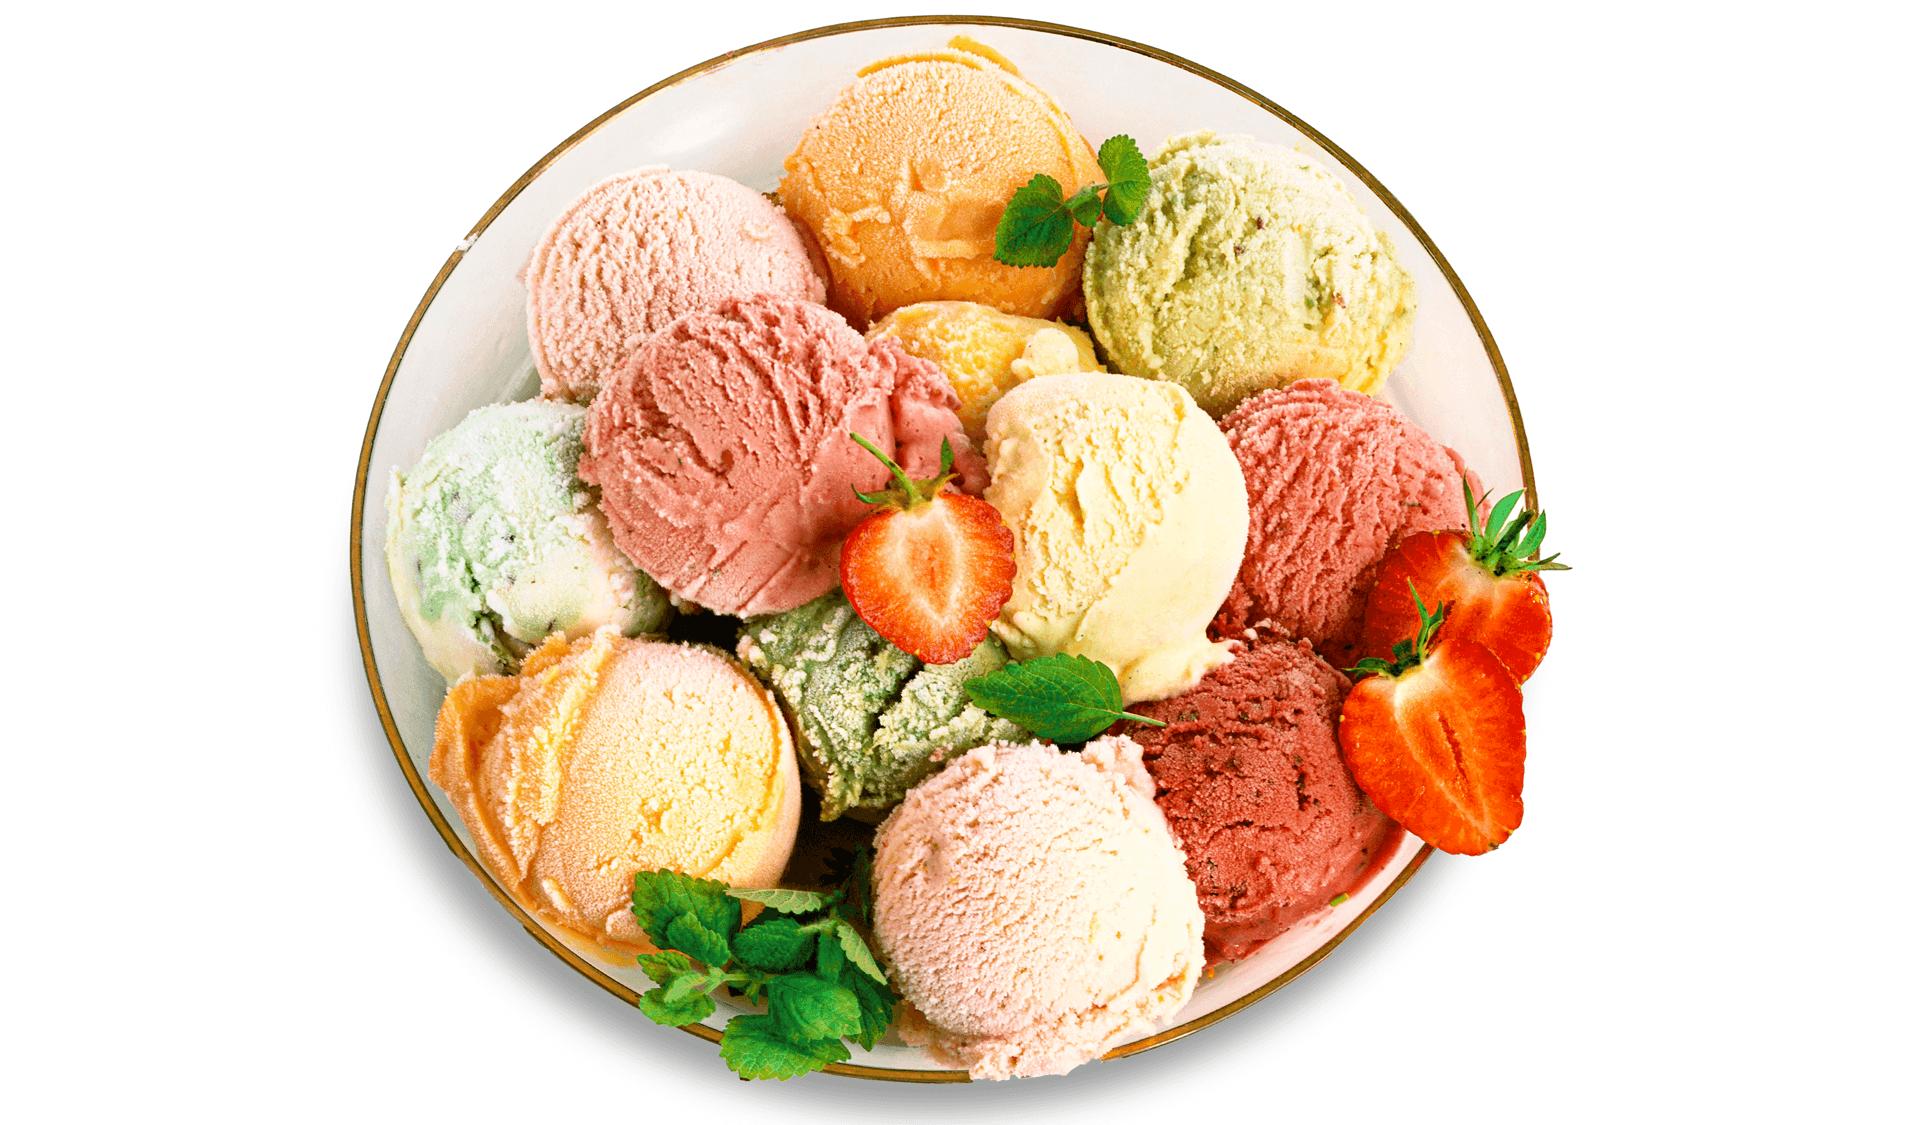 Schale mit verschiedenen Eissorten Erdbeeren Minzblaettern